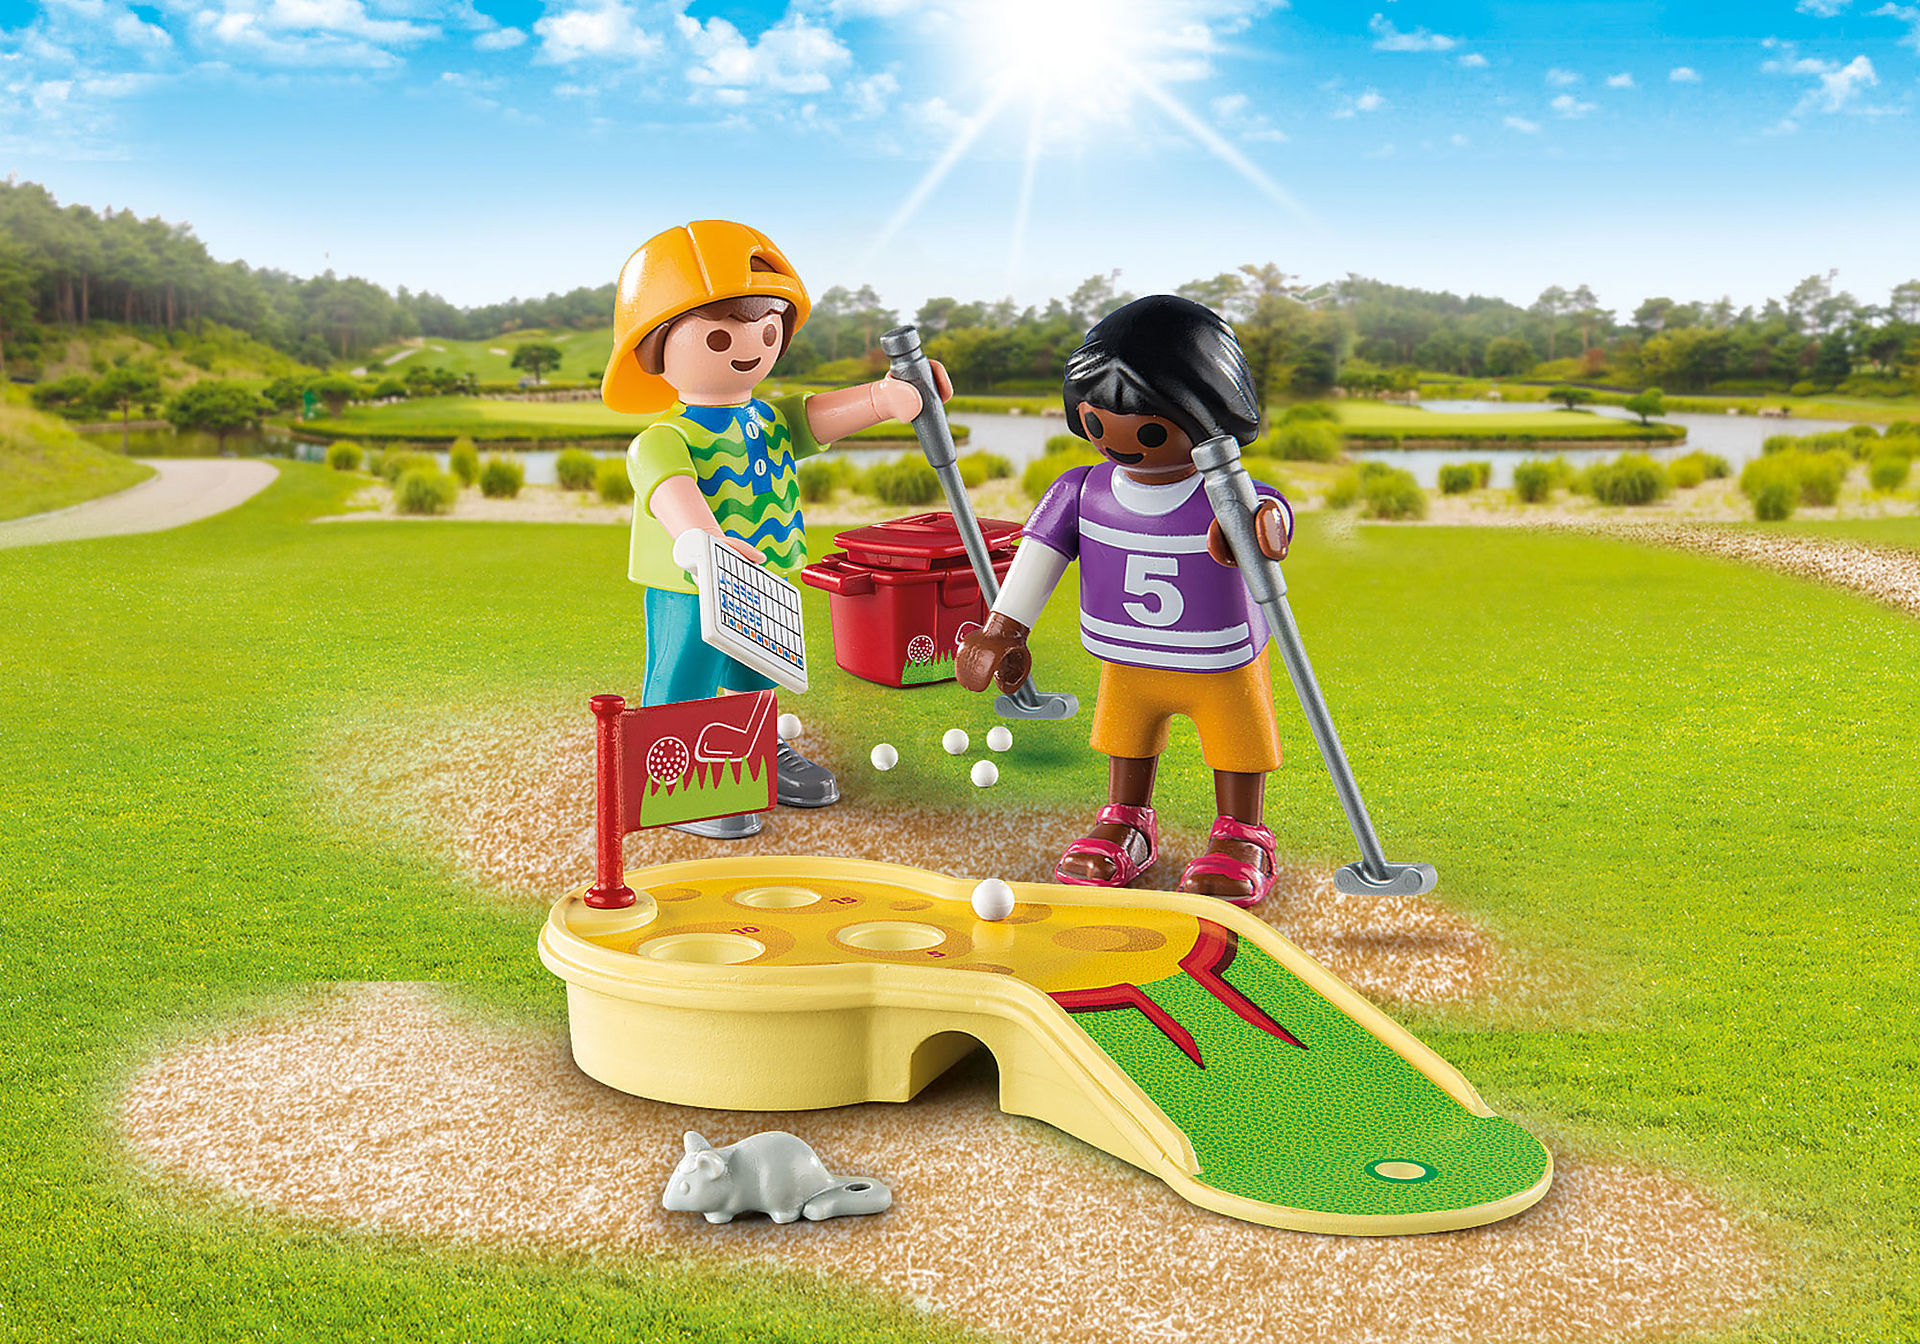 http://media.playmobil.com/i/playmobil/9439_product_detail/Kinderen met minigolf